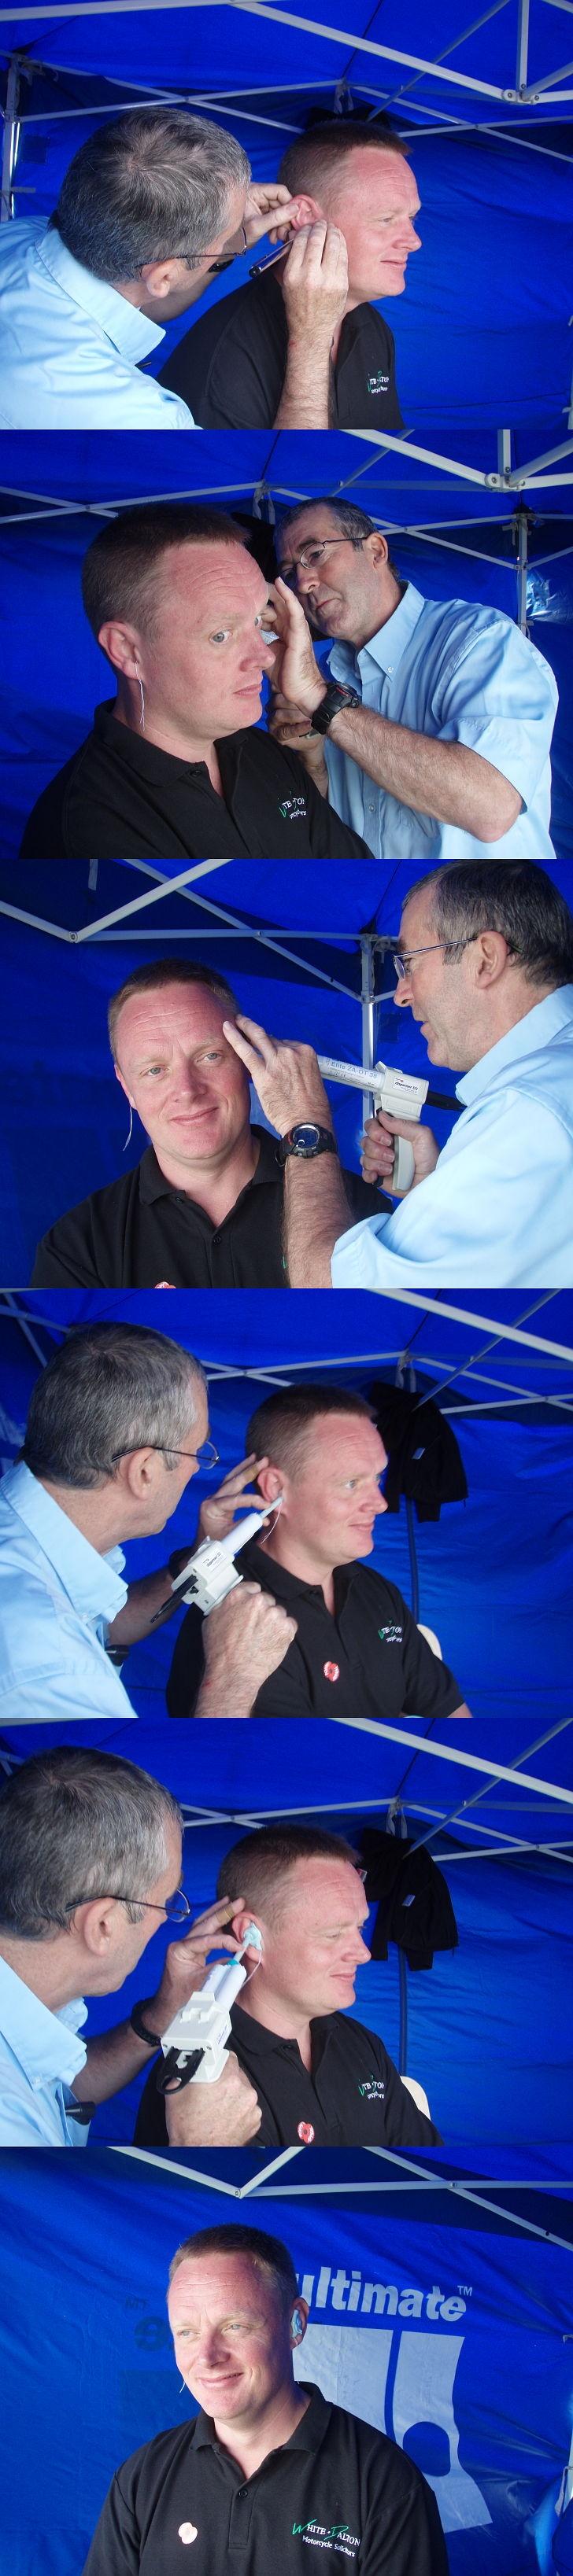 Getting custom made ear plugs made at the London Bike Festival